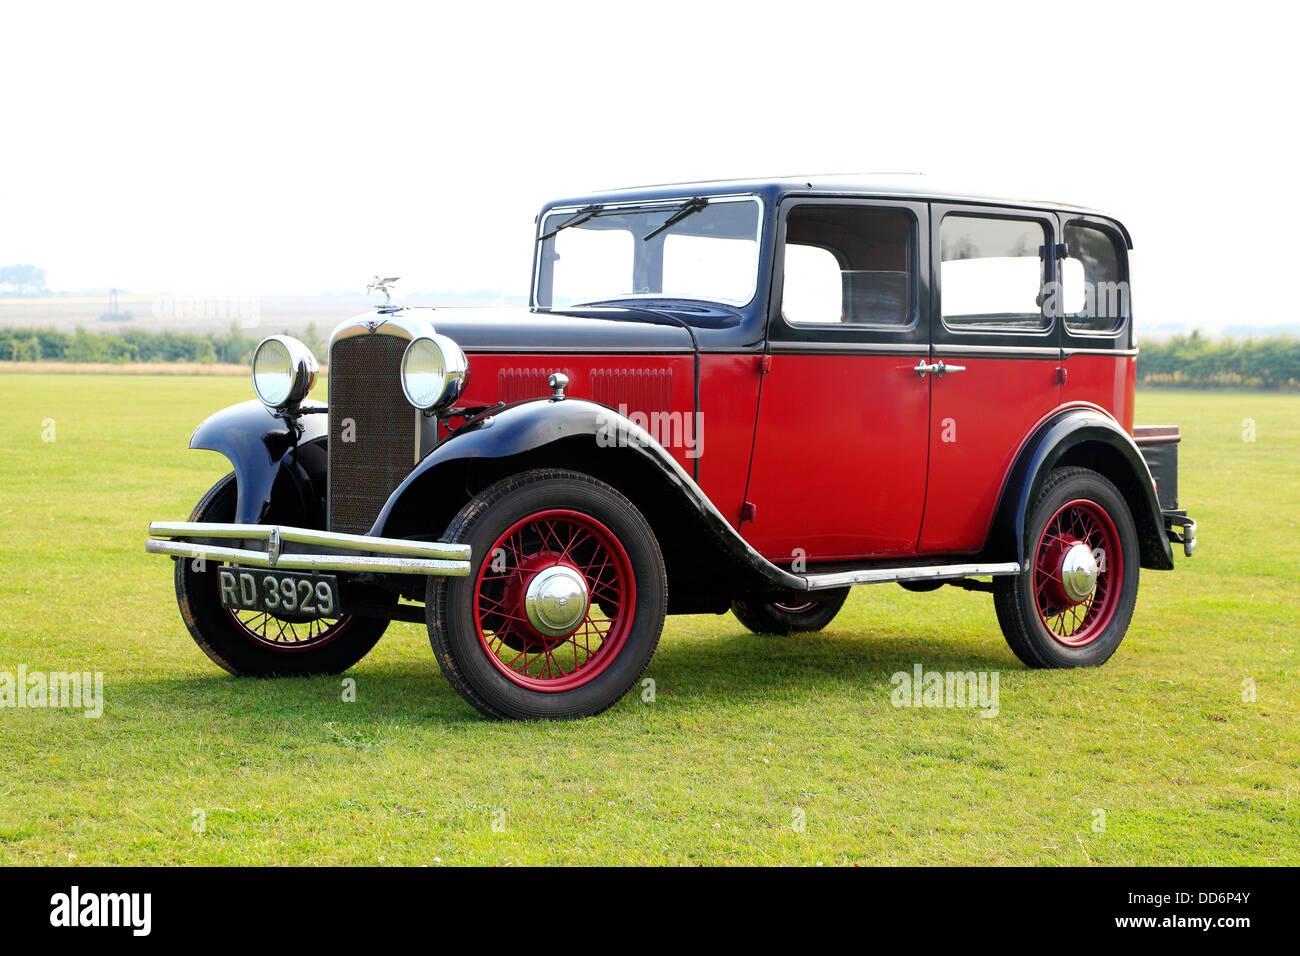 British Classic Cars Stock Photos & British Classic Cars Stock ...